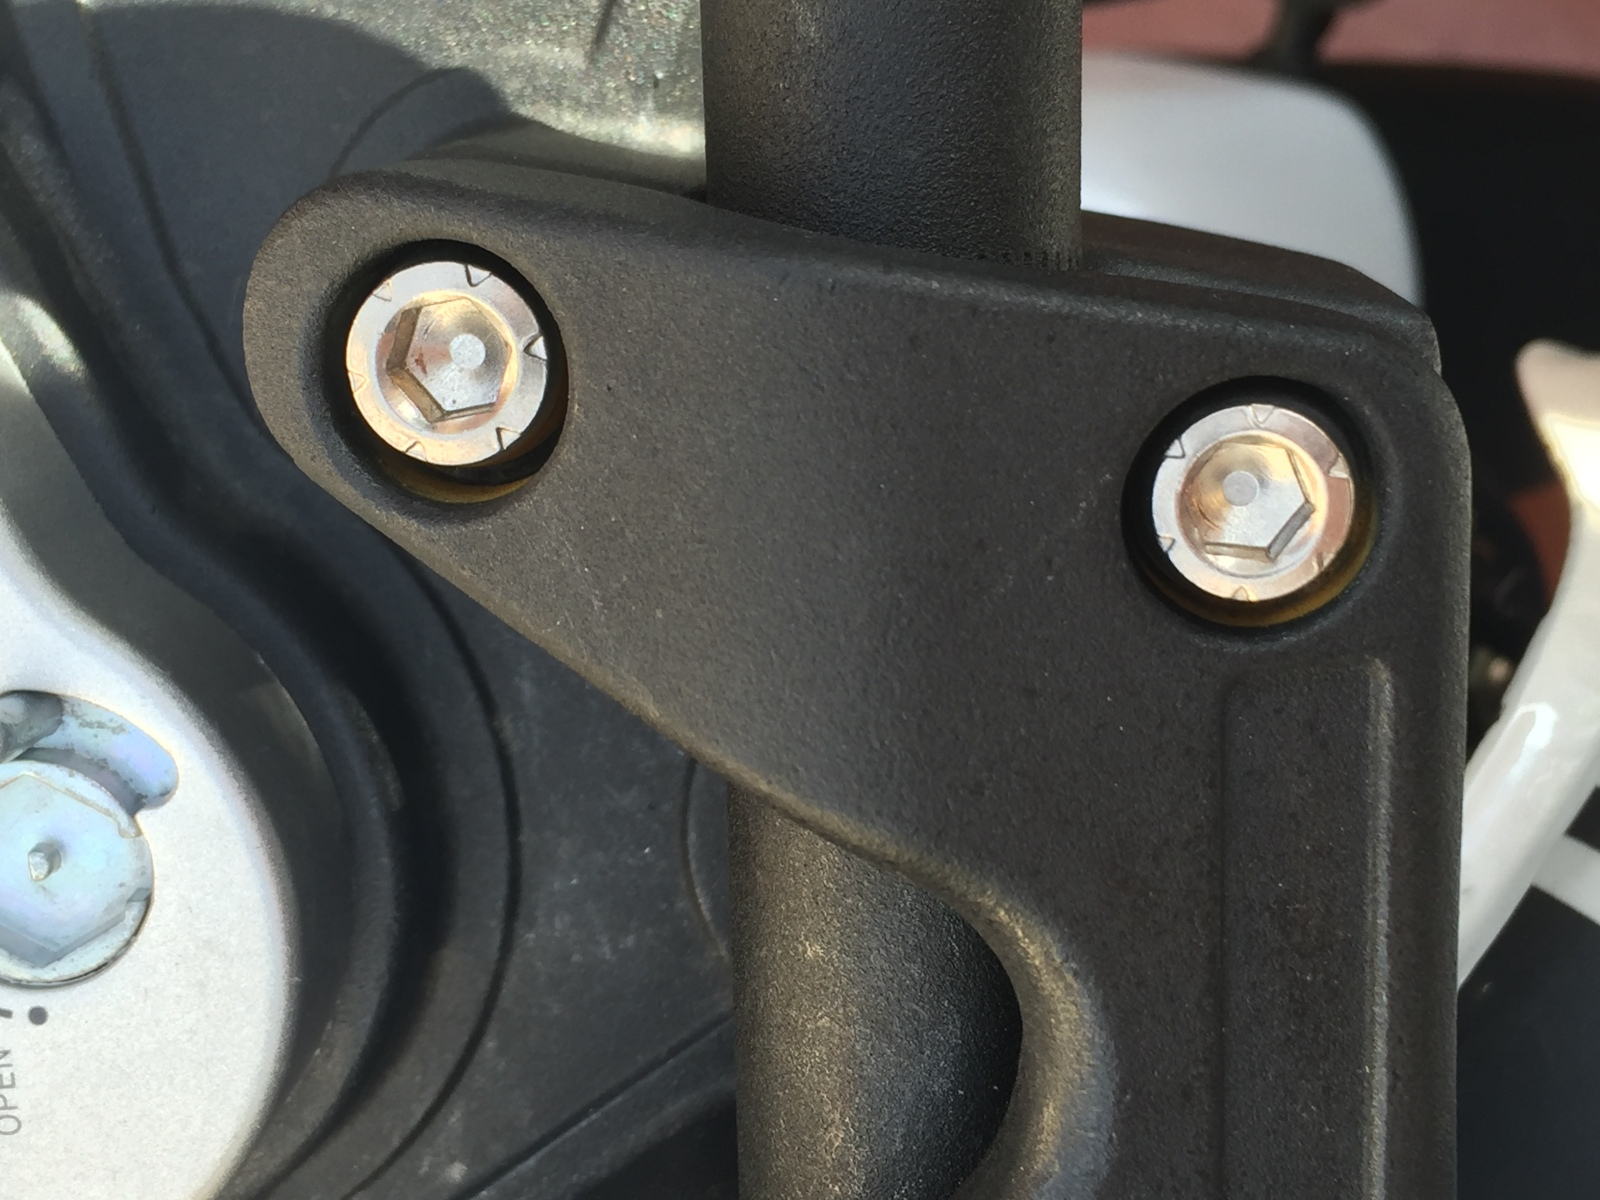 Tornillos oxidados Keeway RKV 125 23ux01i